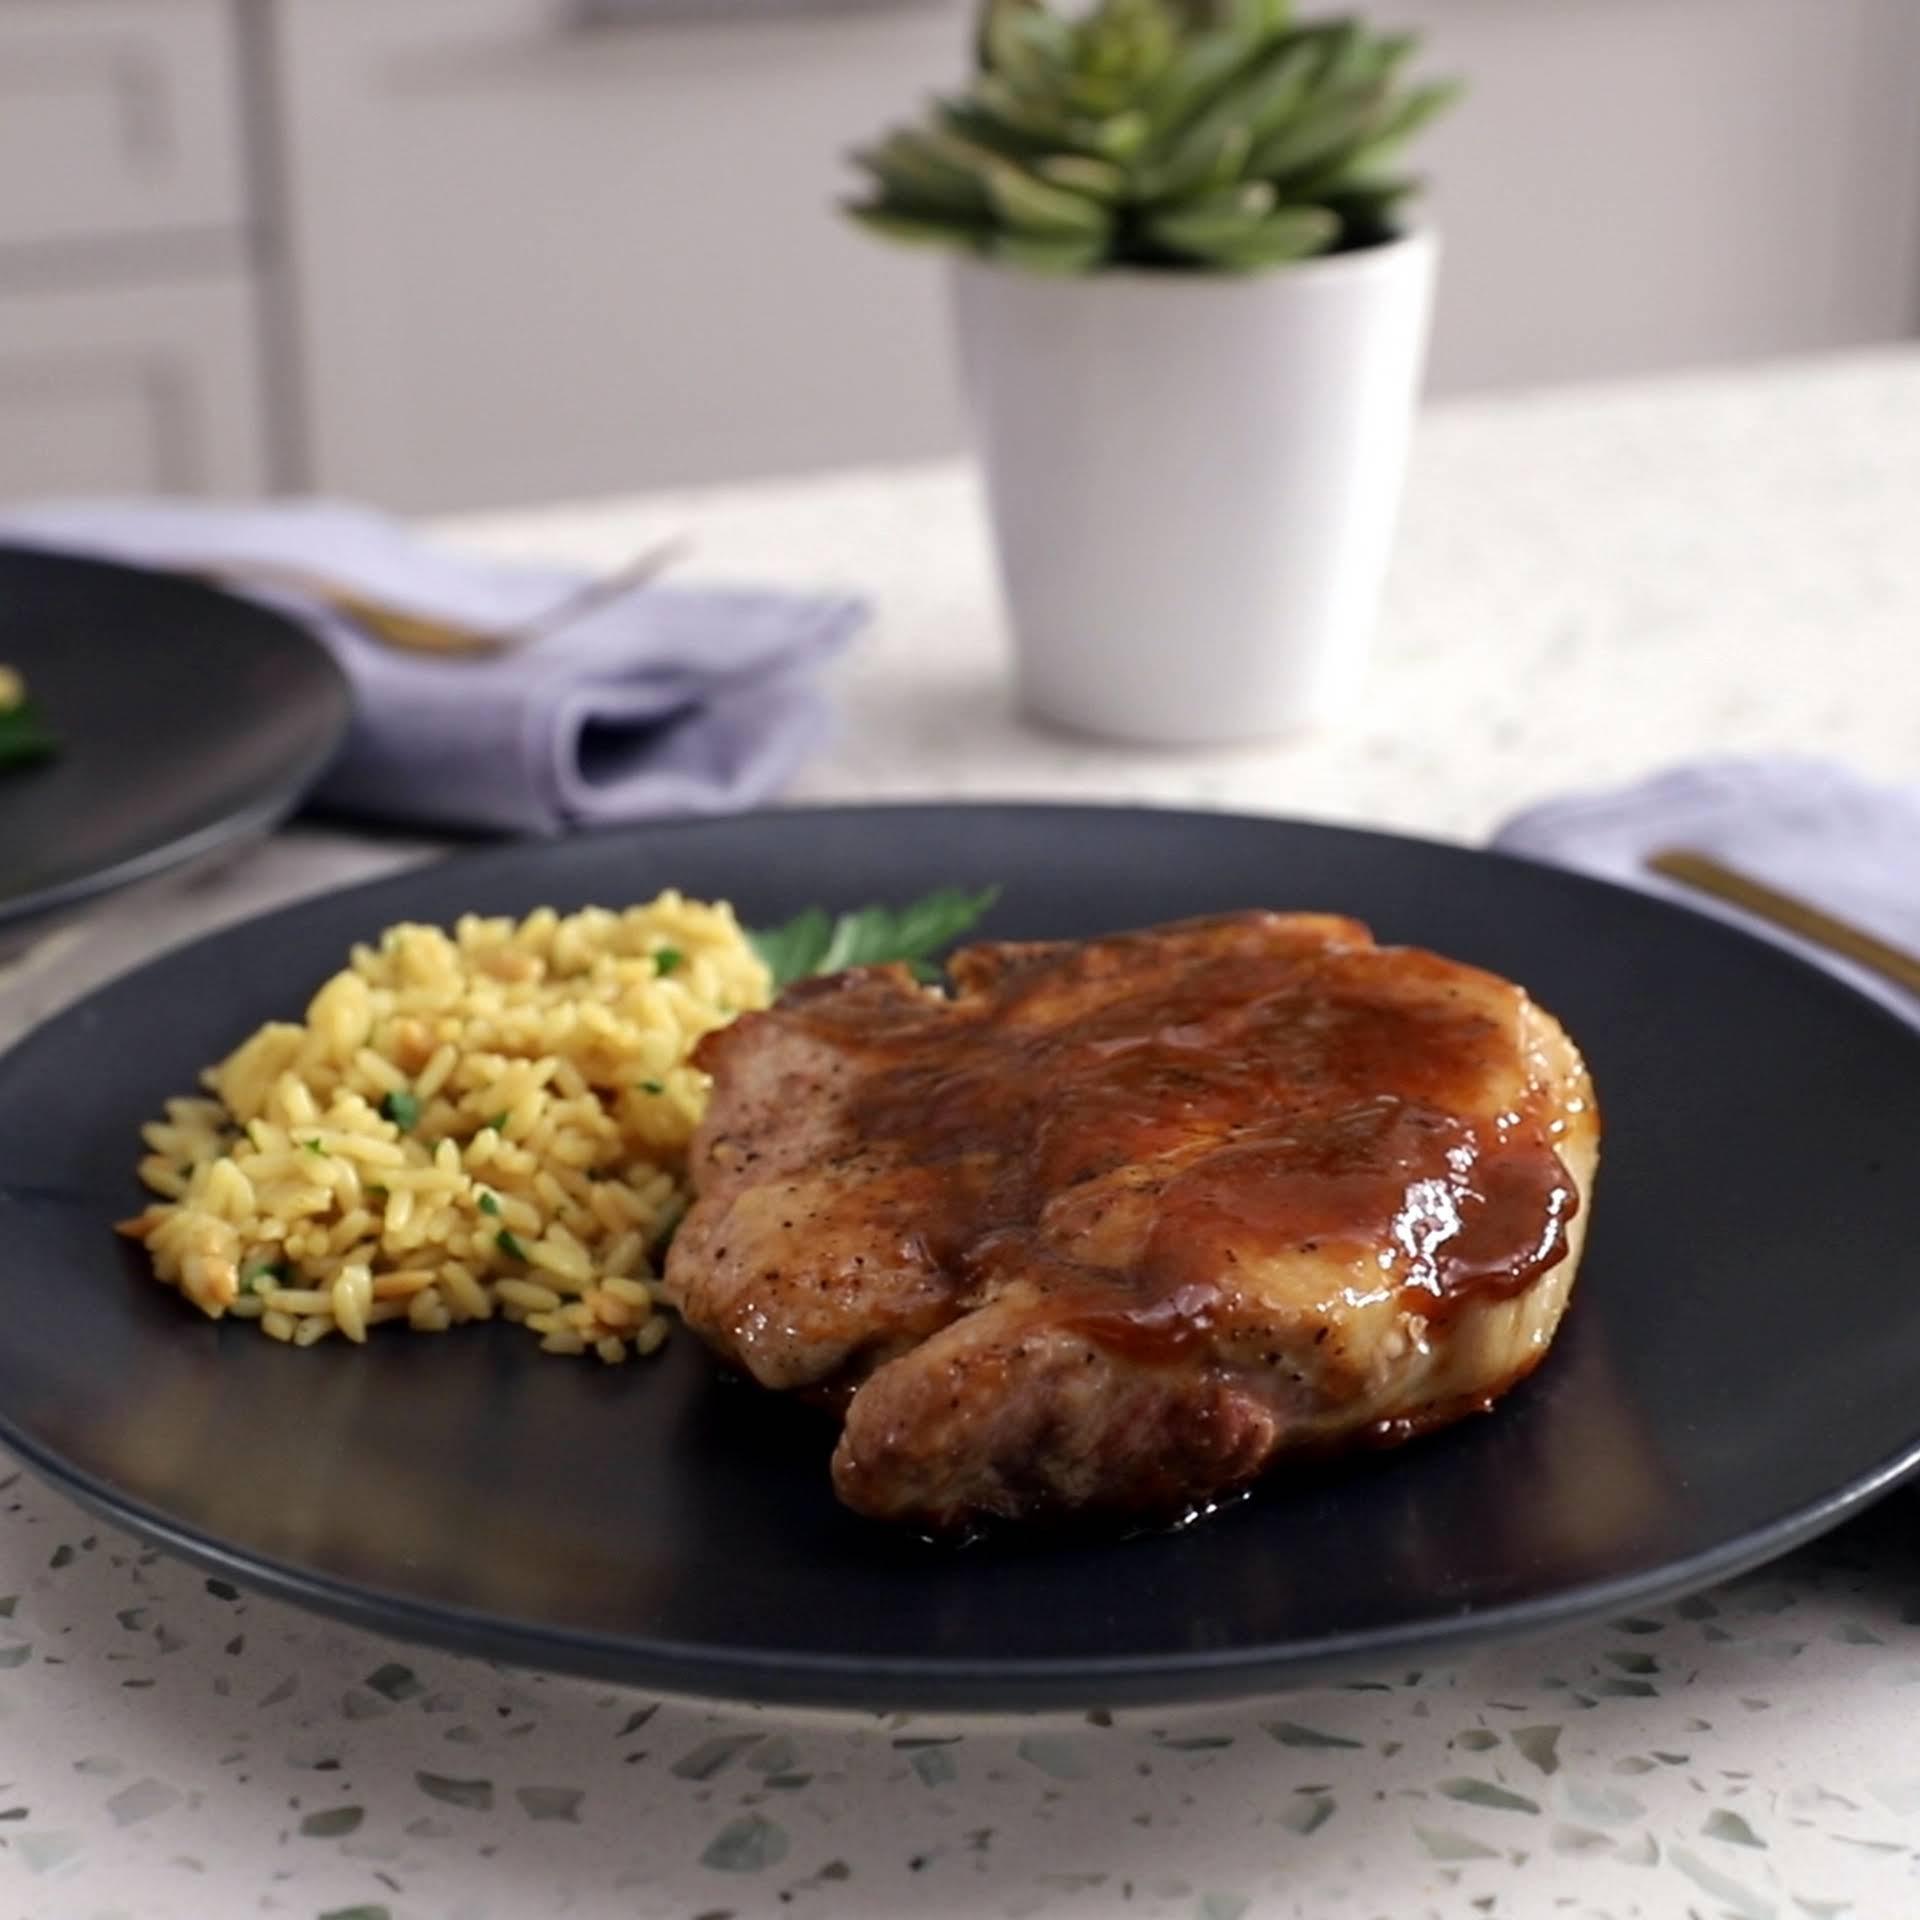 pork chop recipe ketchup brown sugar onion lh2.googleusercontent.com/Ex-WEoEr2a2CFMfqGjS-NNI